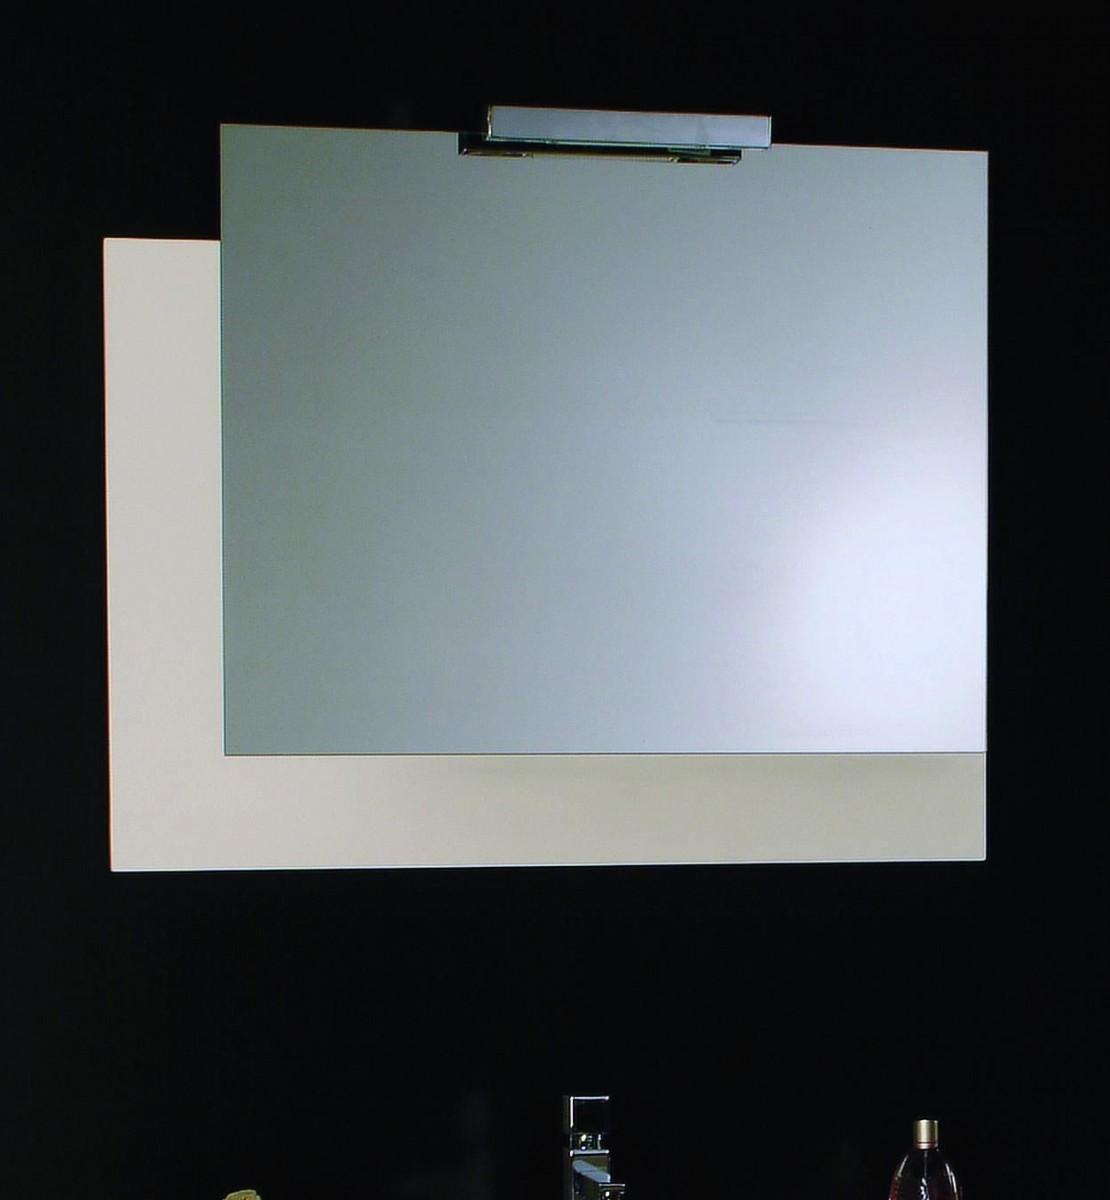 Espejo kios marco madera espejos espejos - Espejos marco madera ...